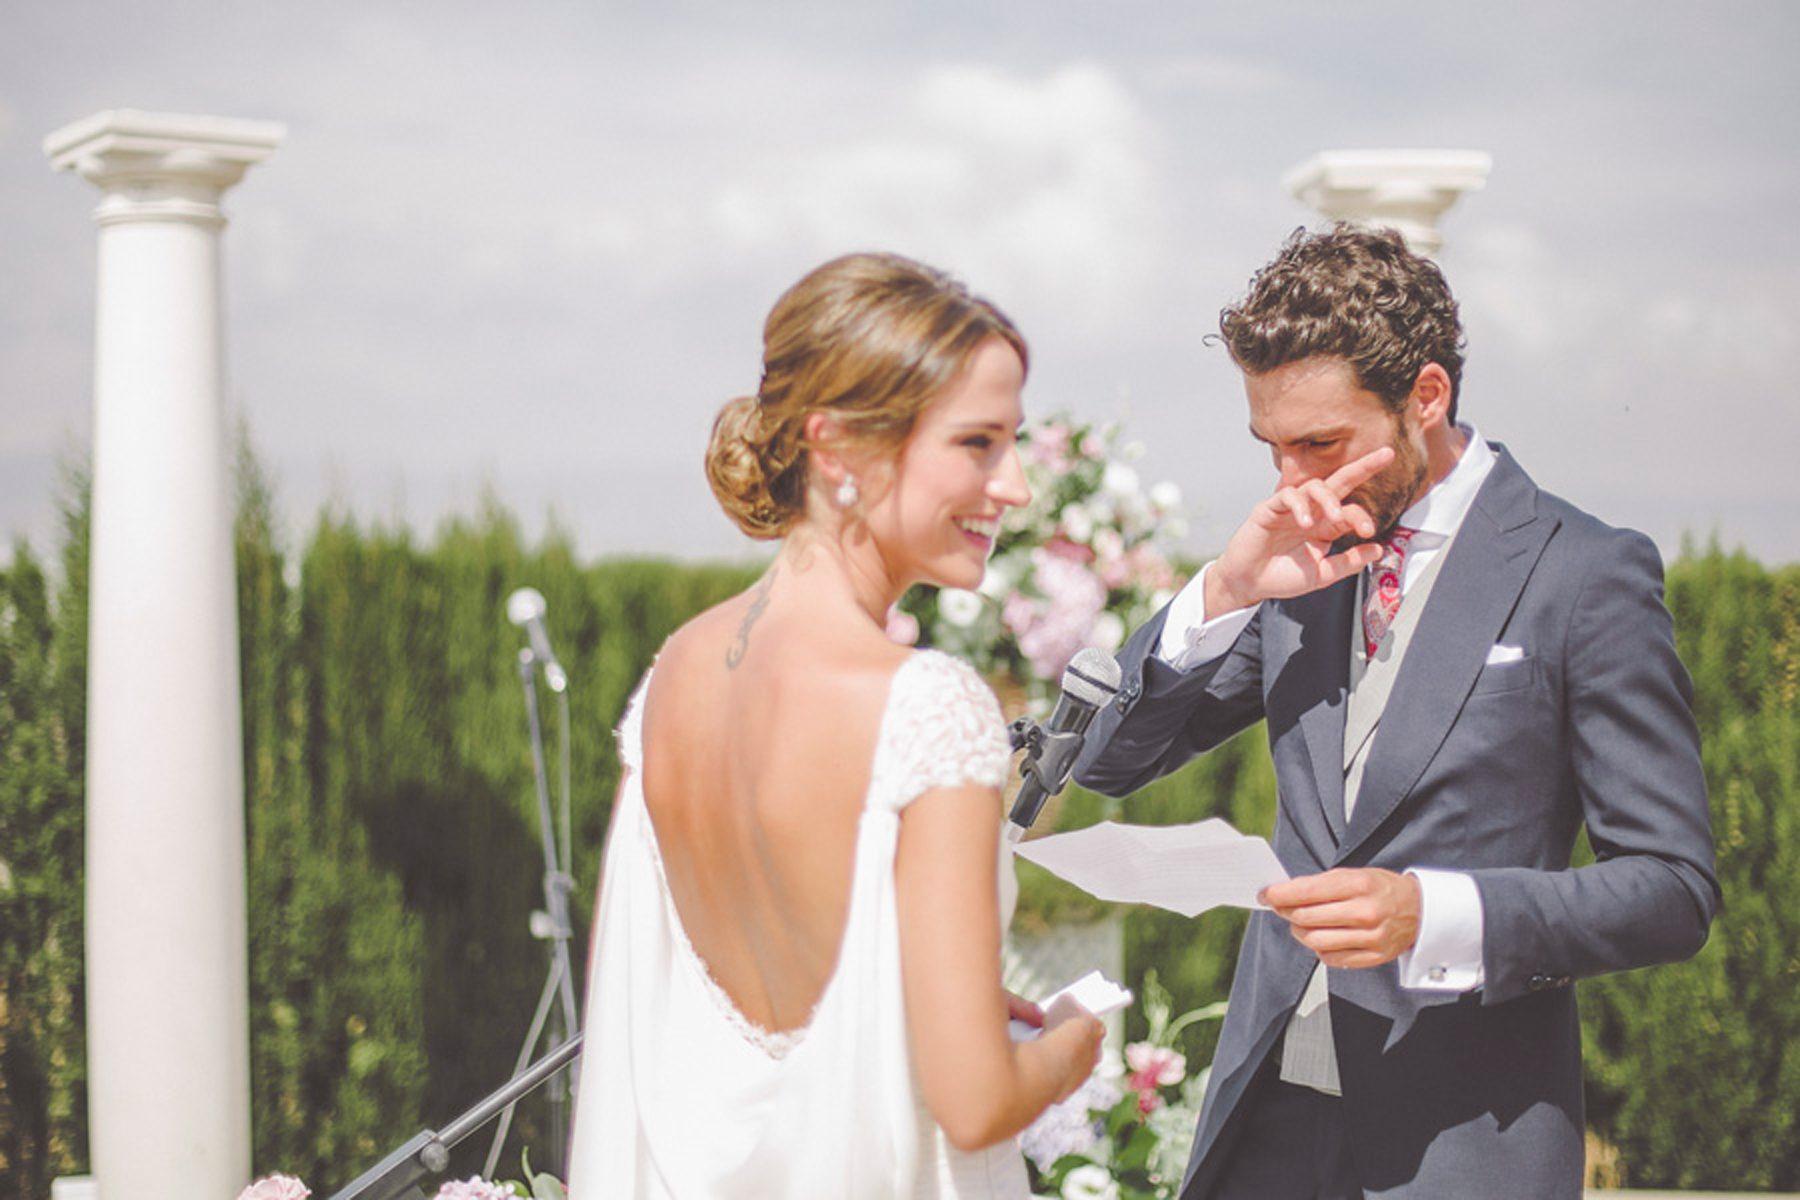 nara_connection_volvoreta-bodas